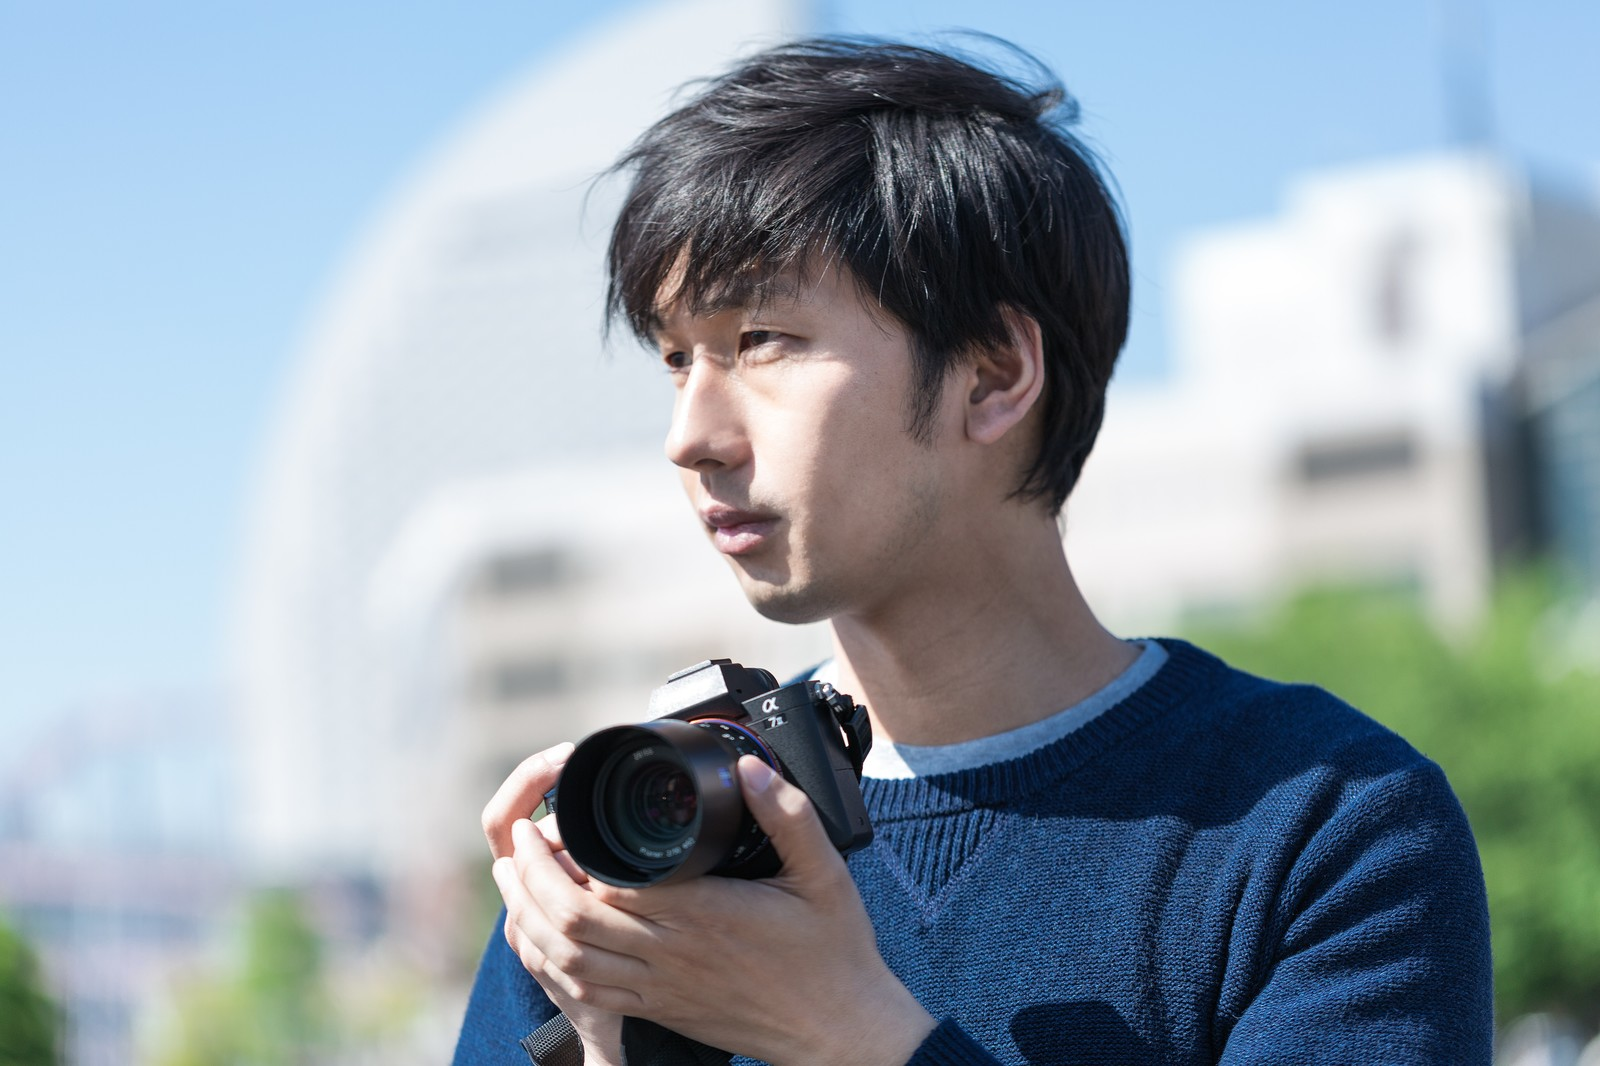 眞栄田郷敦の画像 p1_19